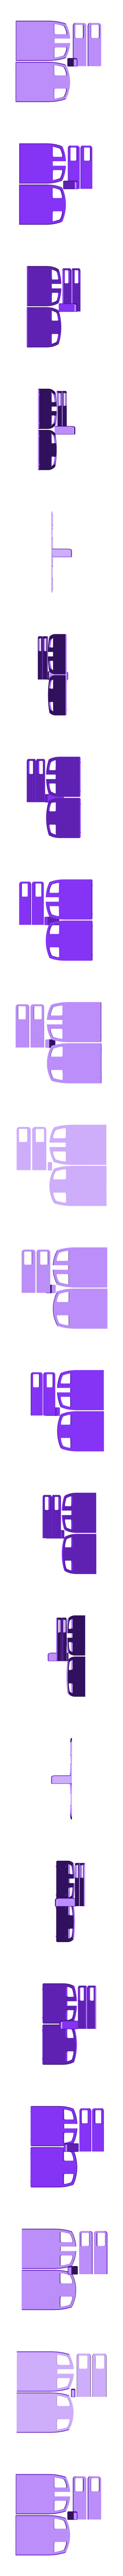 diesel01c_part07.stl Download STL file Diesel-01-C locomotive - ERS and others compatibile, FDM 3D printable • 3D printer object, euroreprap_eu